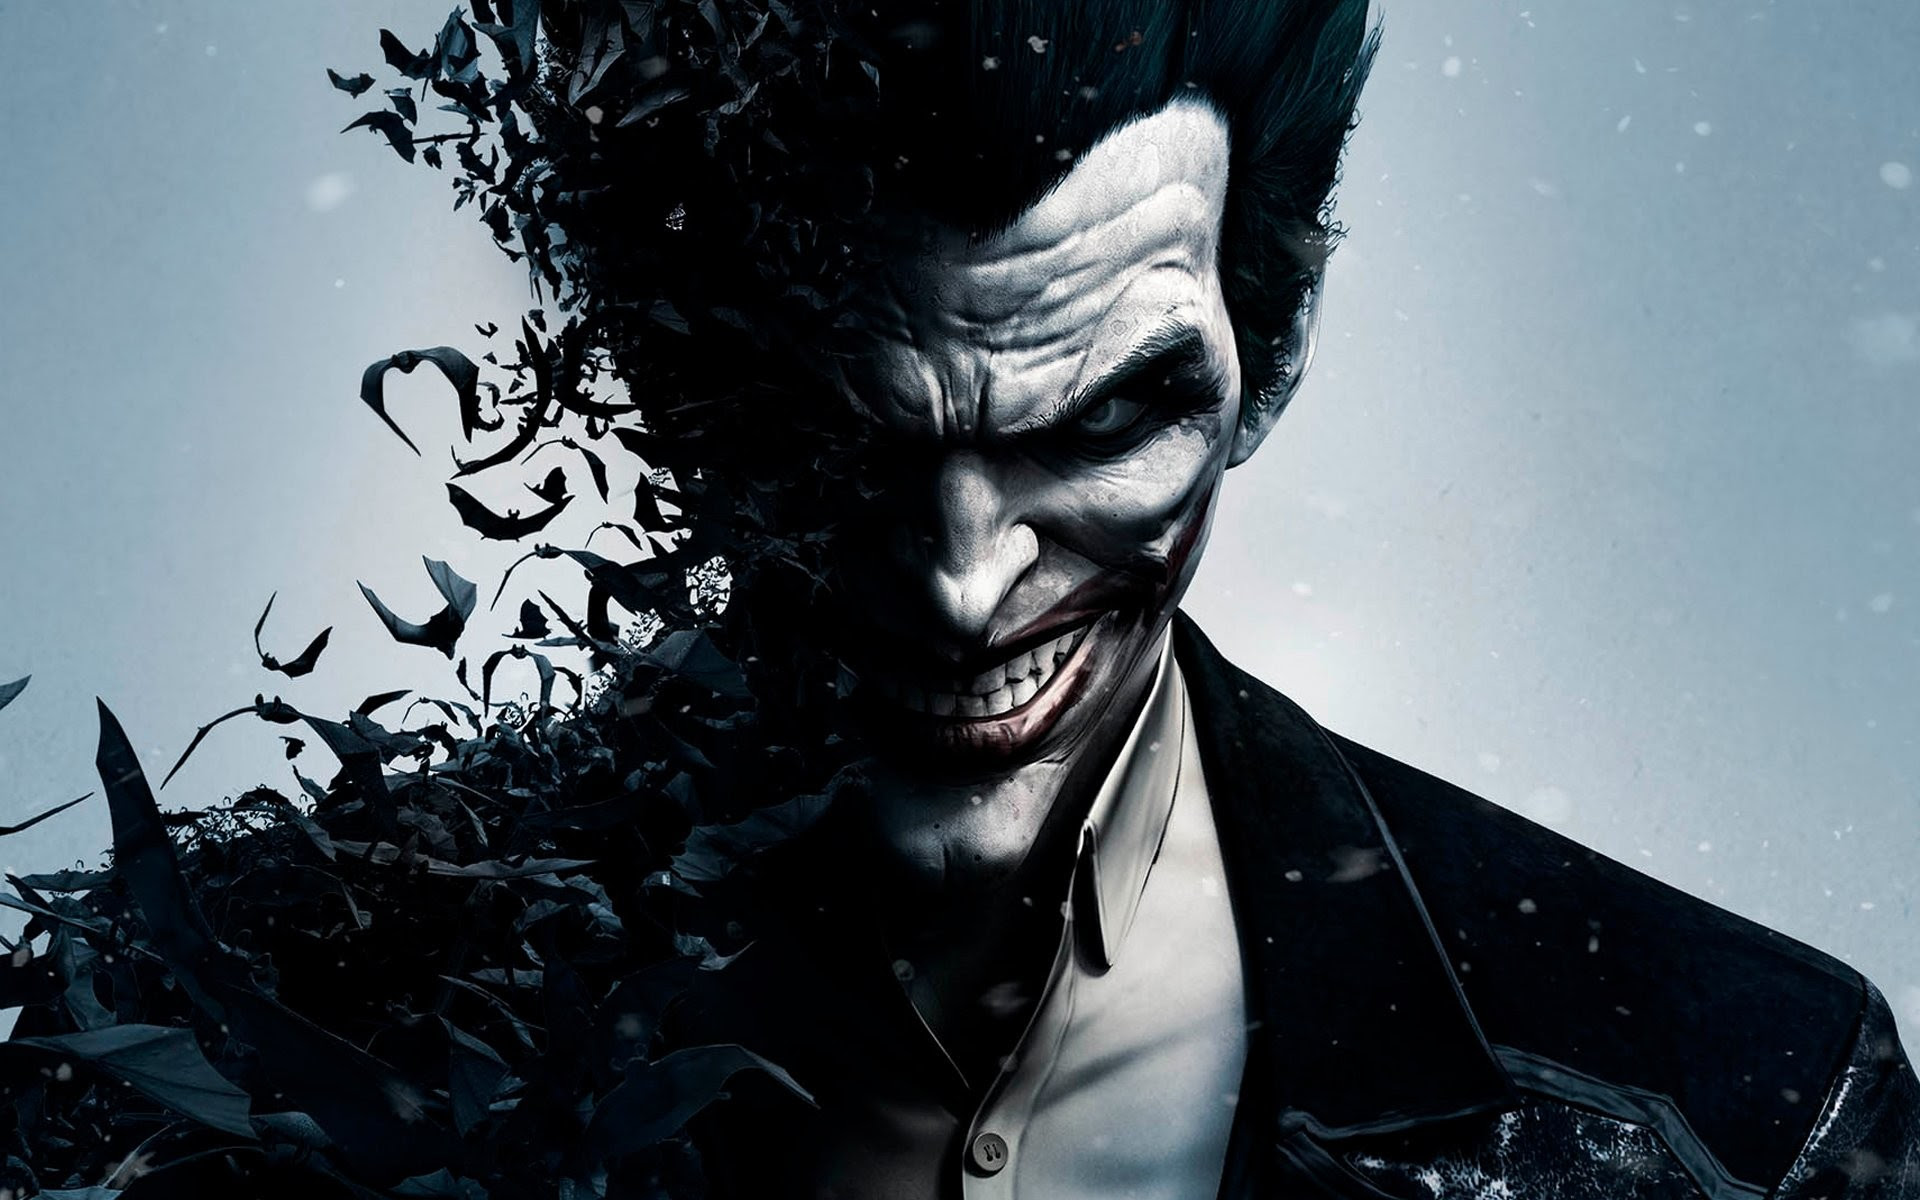 WoowPaper Joker 3d Hd Wallpapers Download